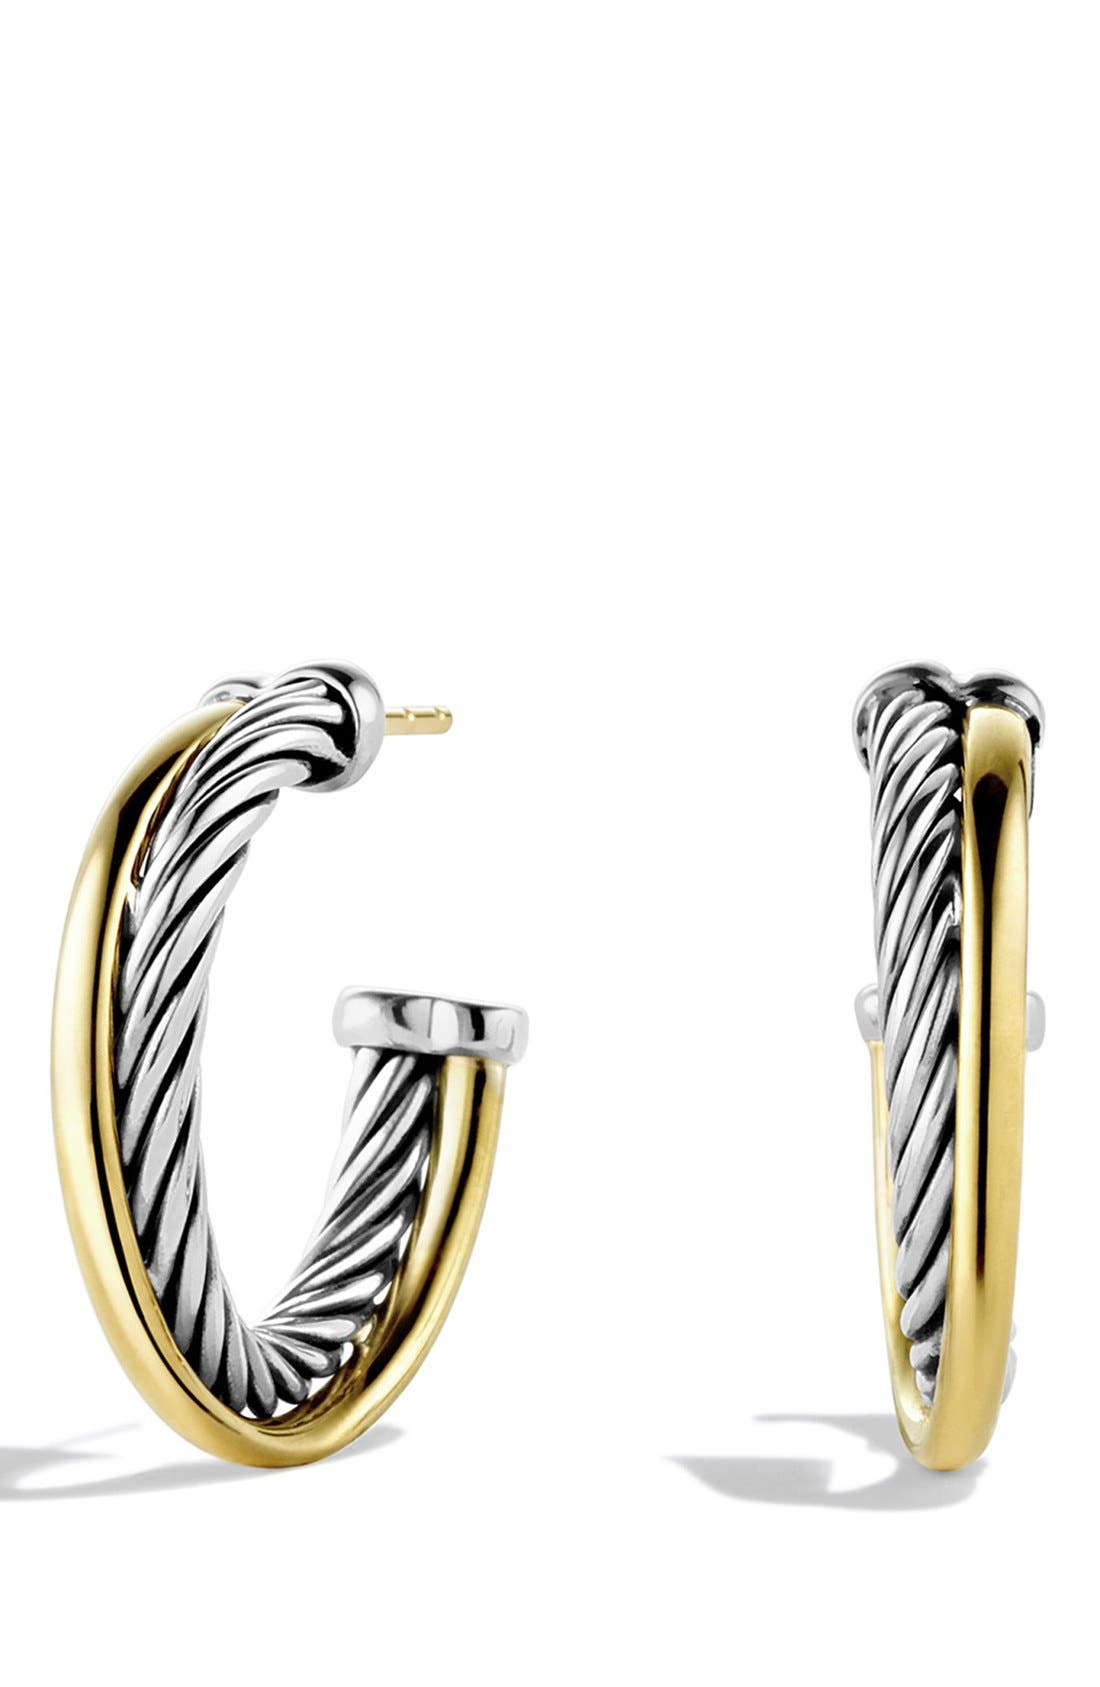 david yurman small hoop earrings with gold